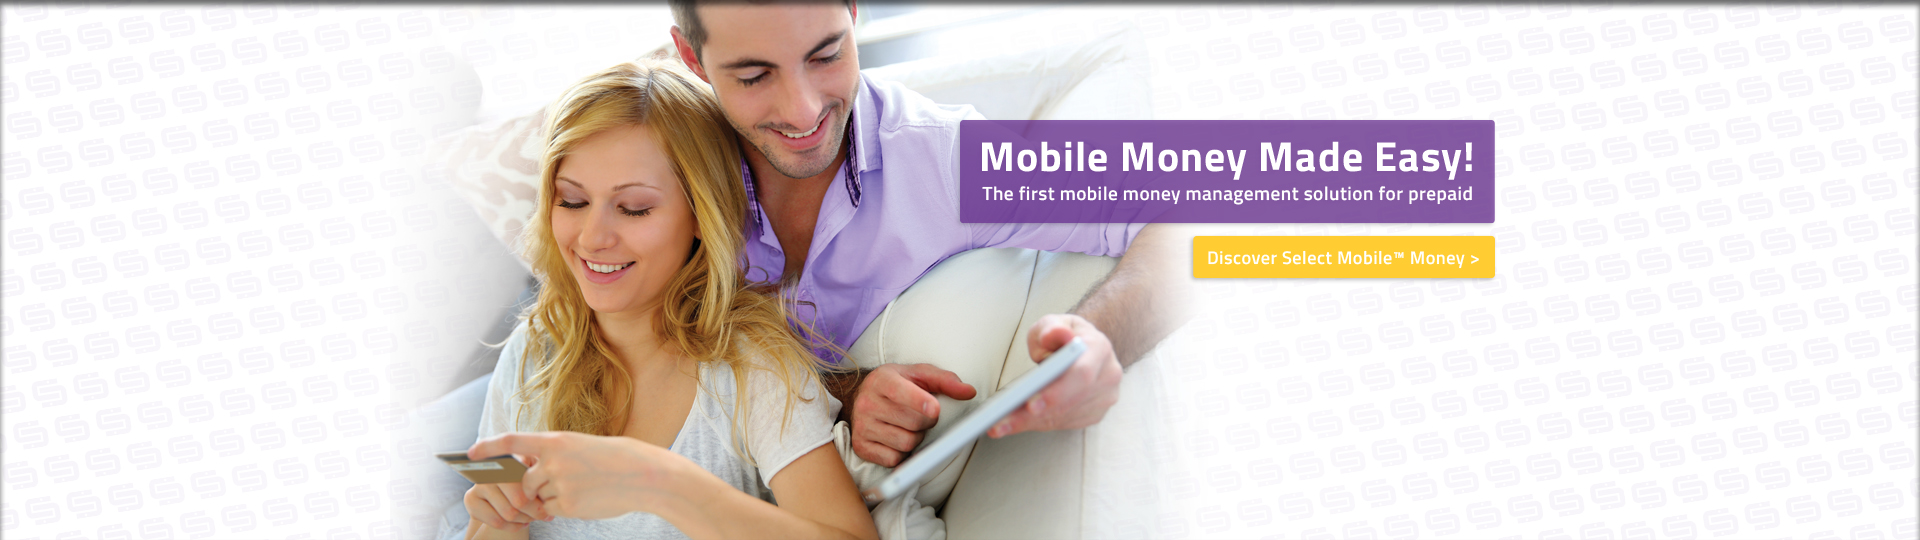 Mobile Money Made Easy!